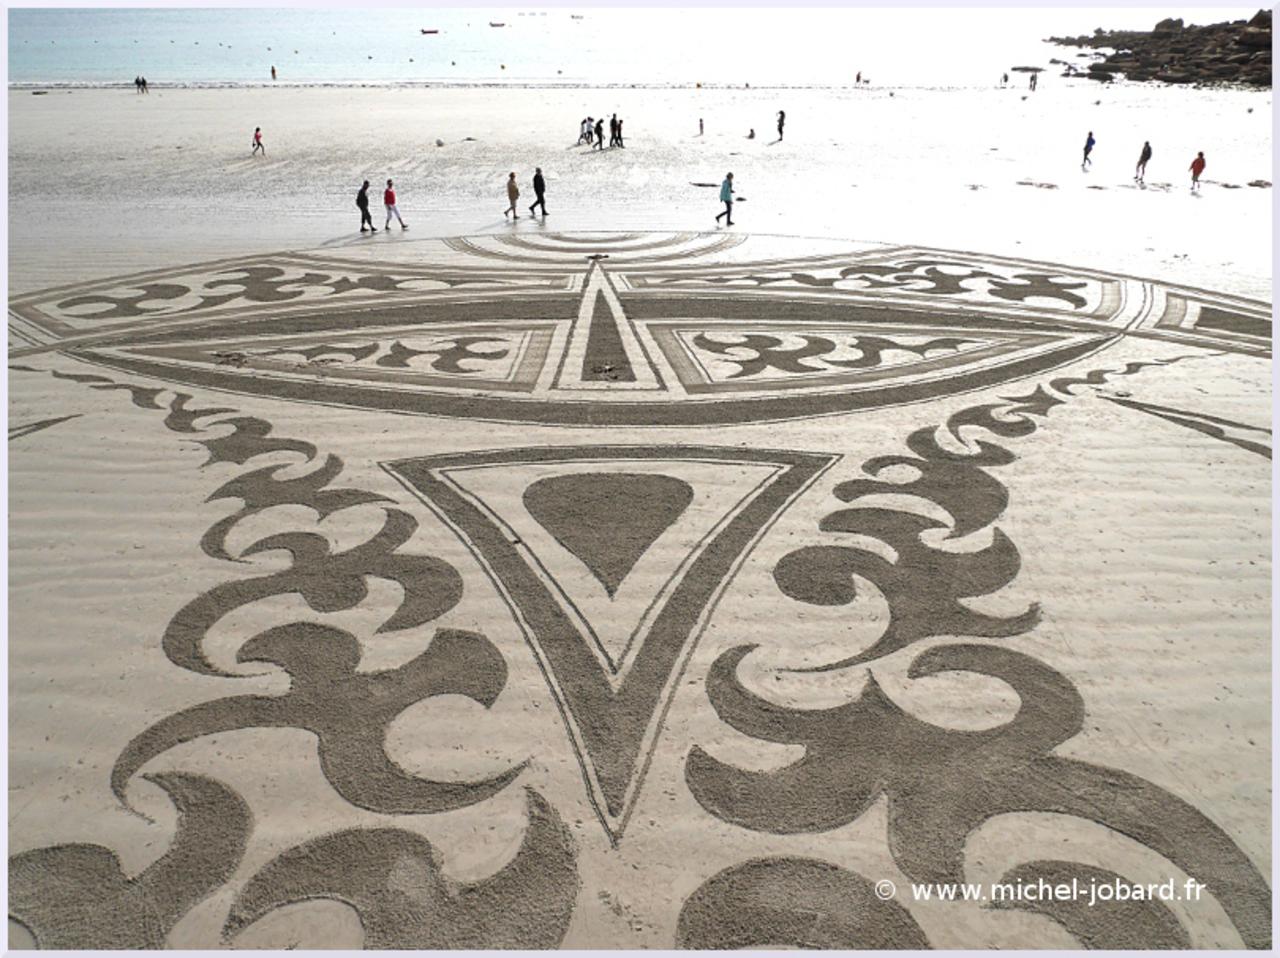 beach-art-celtitude-19-septembre-2016-01